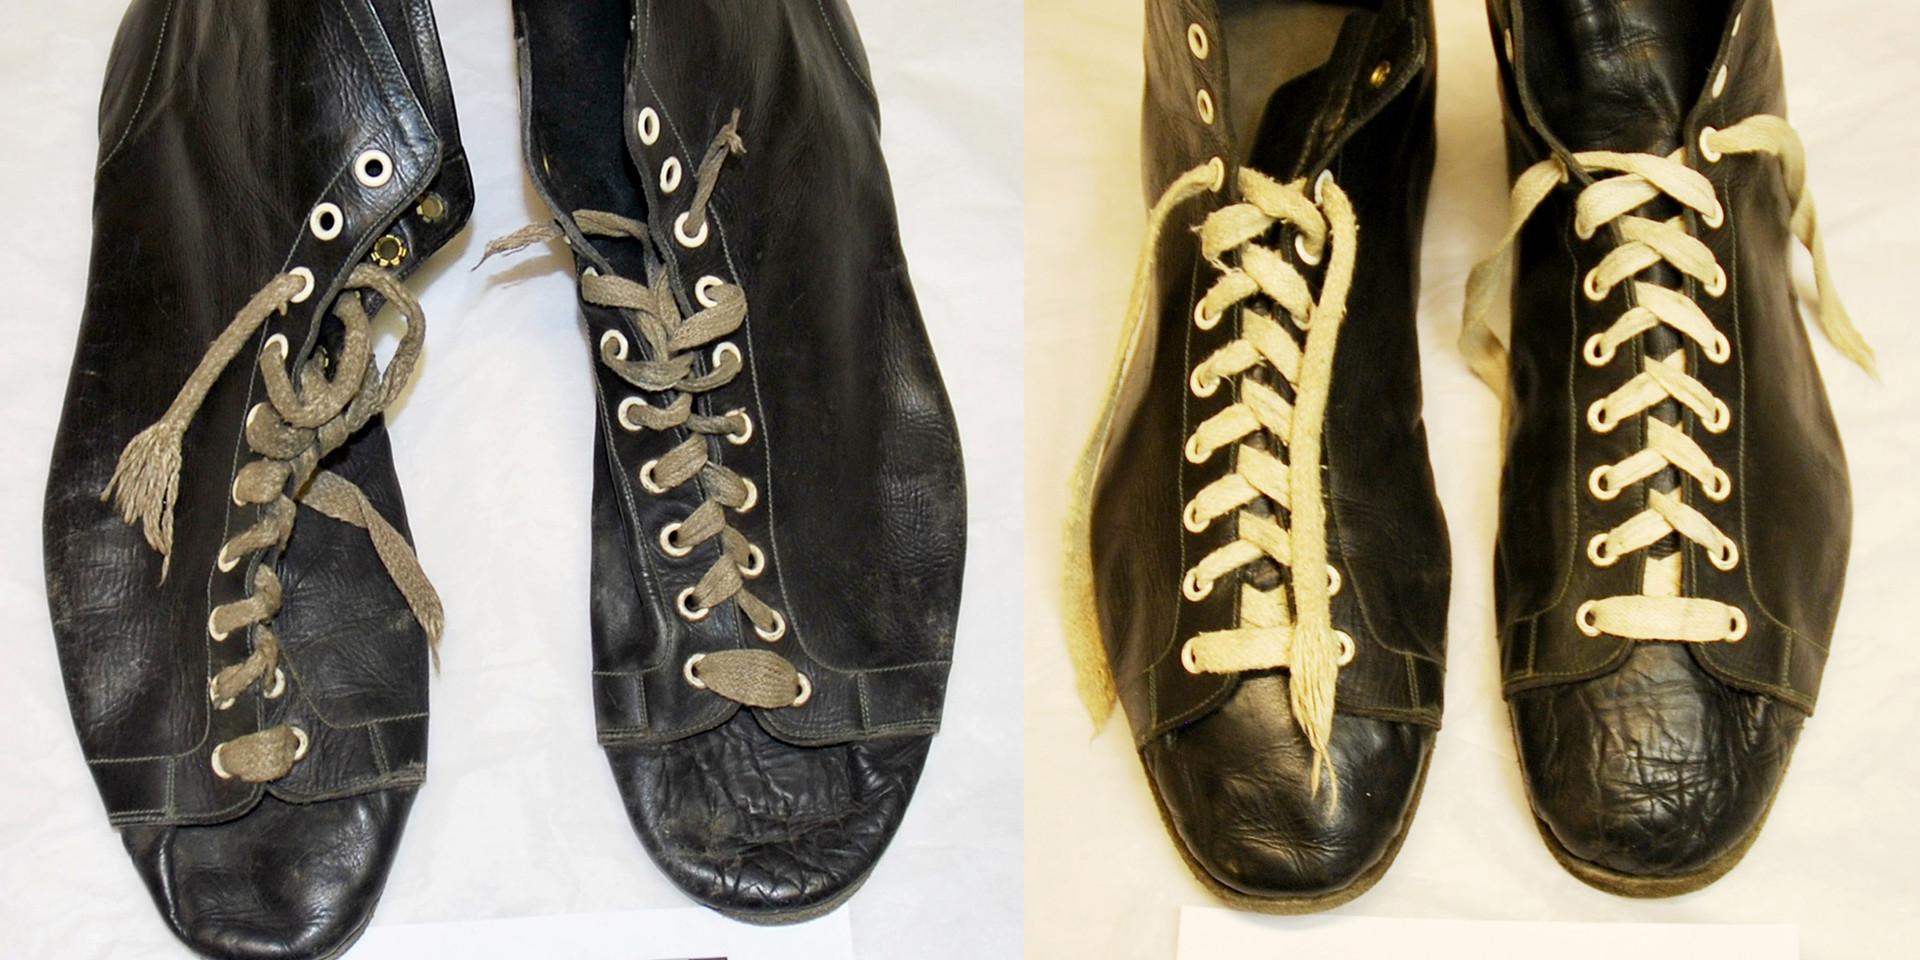 Boxer boots